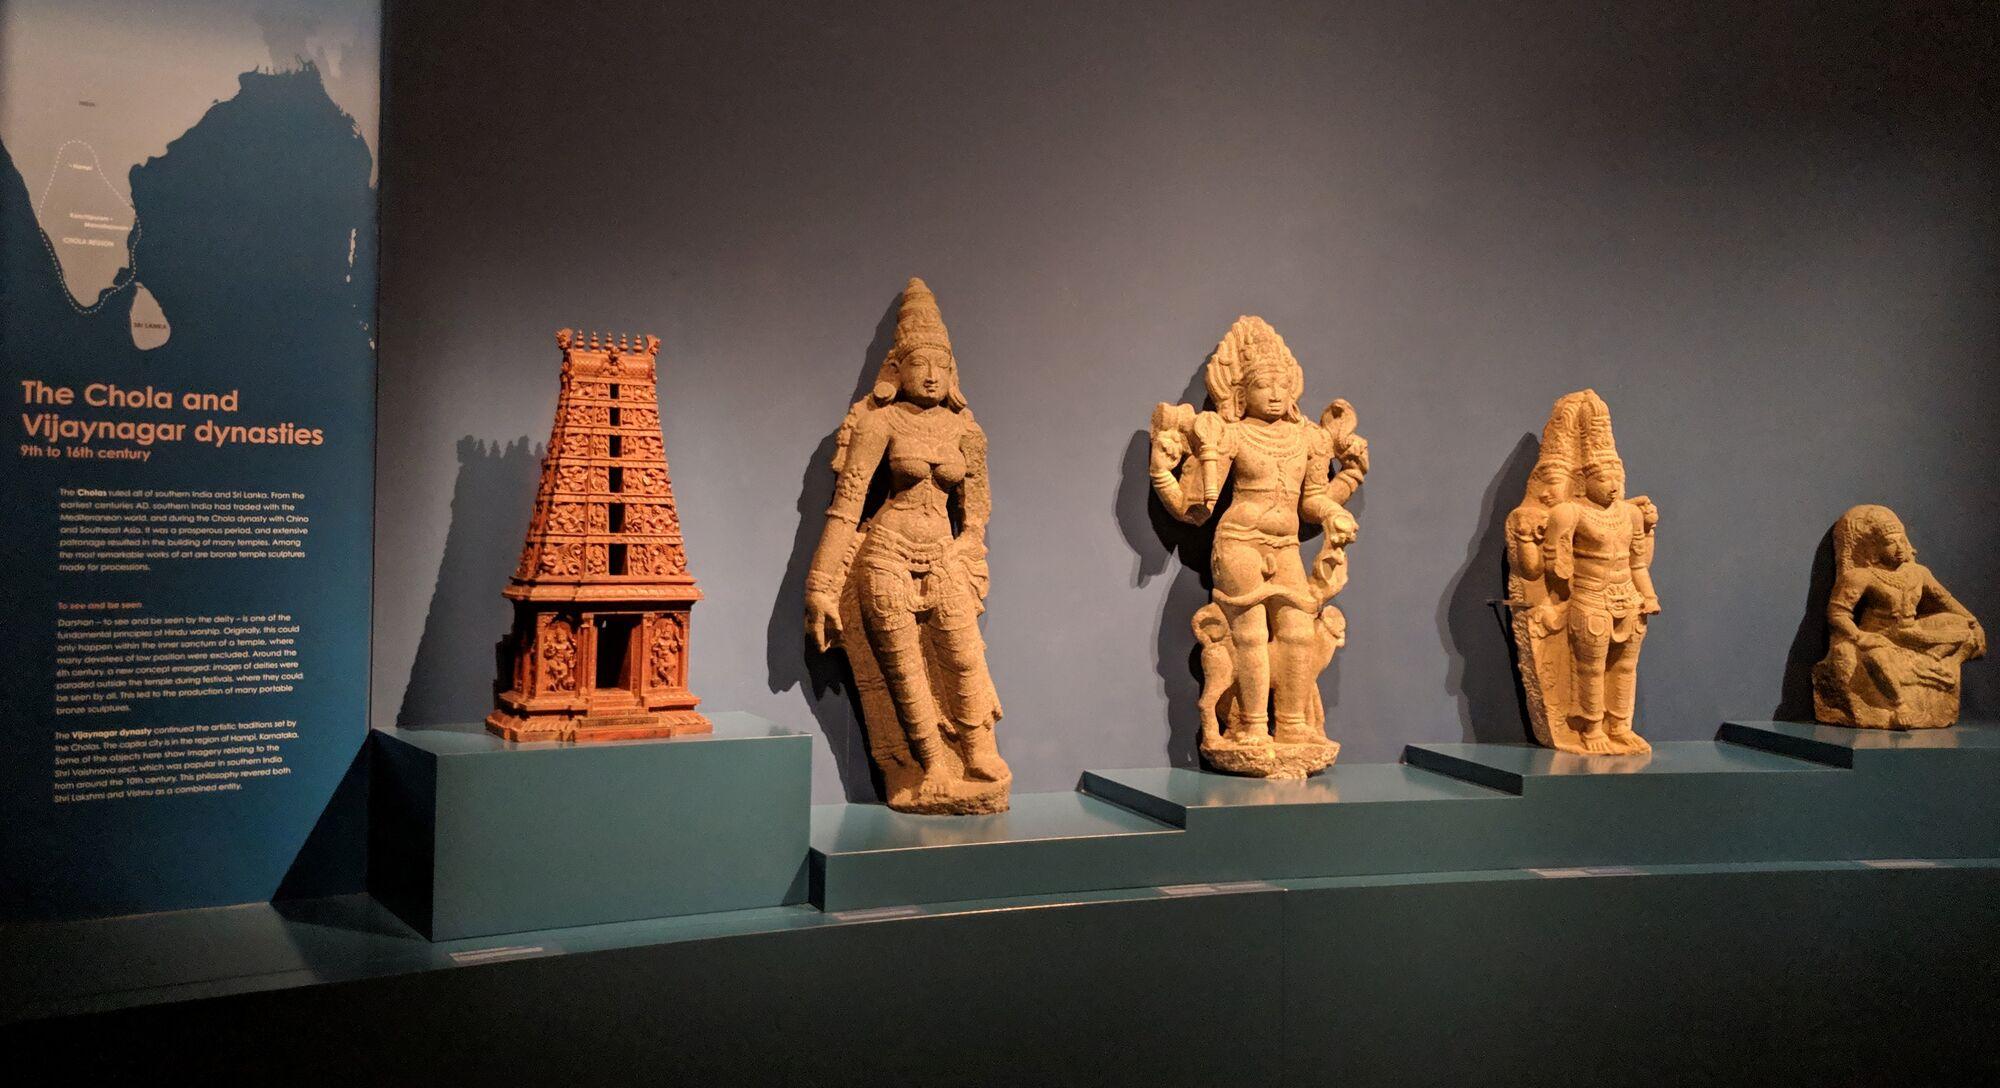 The Chola and Vijaynagar dynasties (9th to 16th Century)